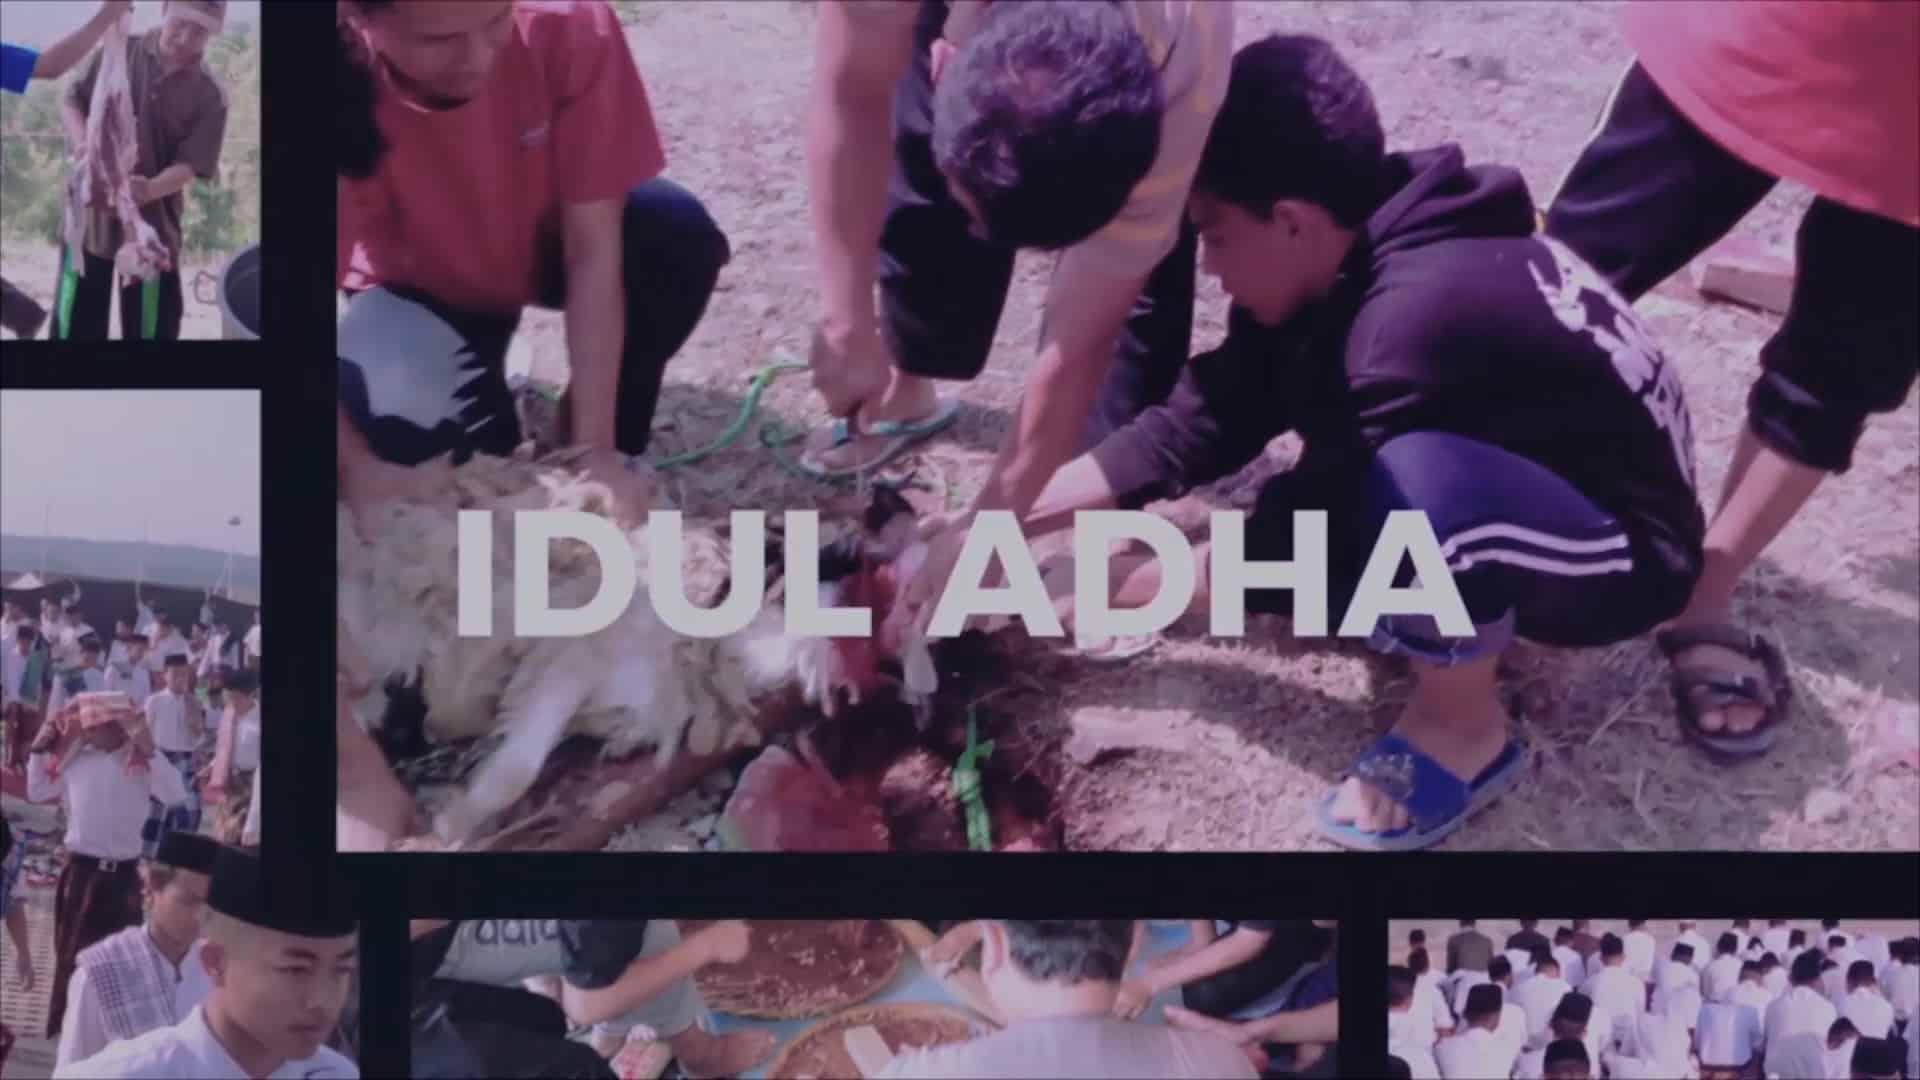 05. QURBAN - IDUL ADHA